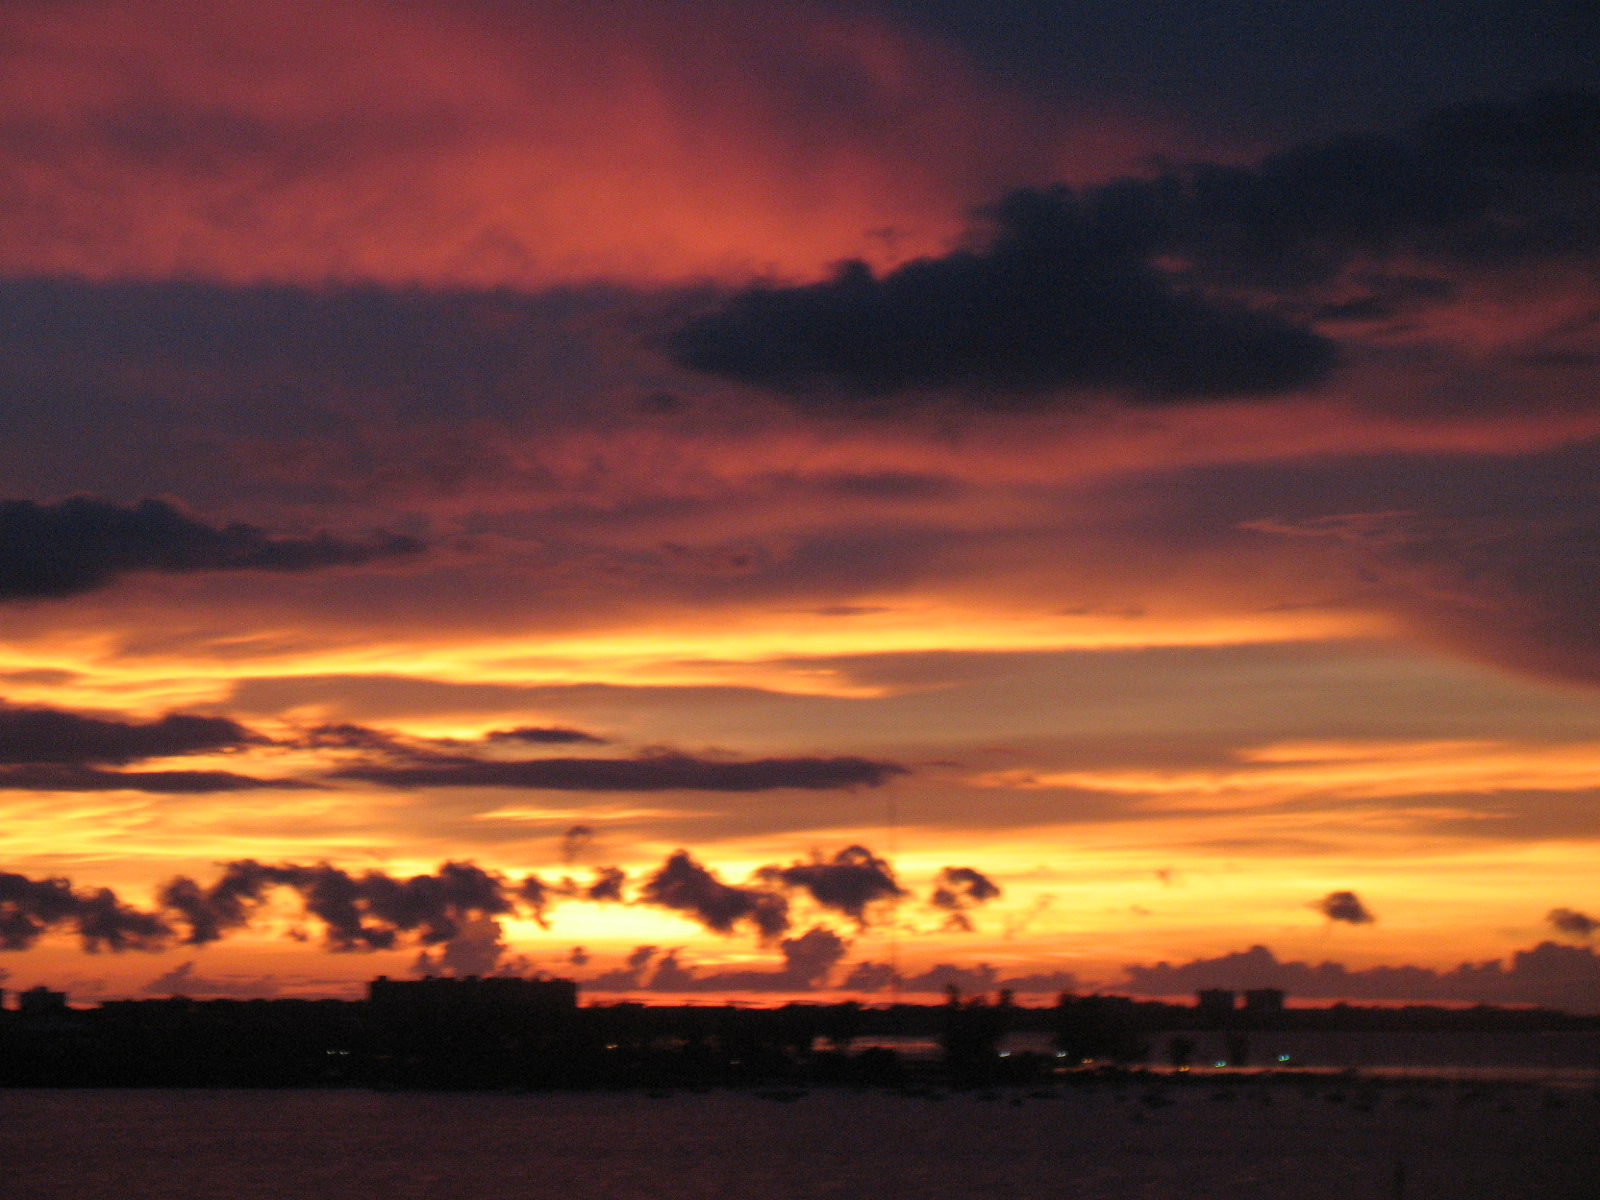 Liquidsummer The Most Amazing Sunset